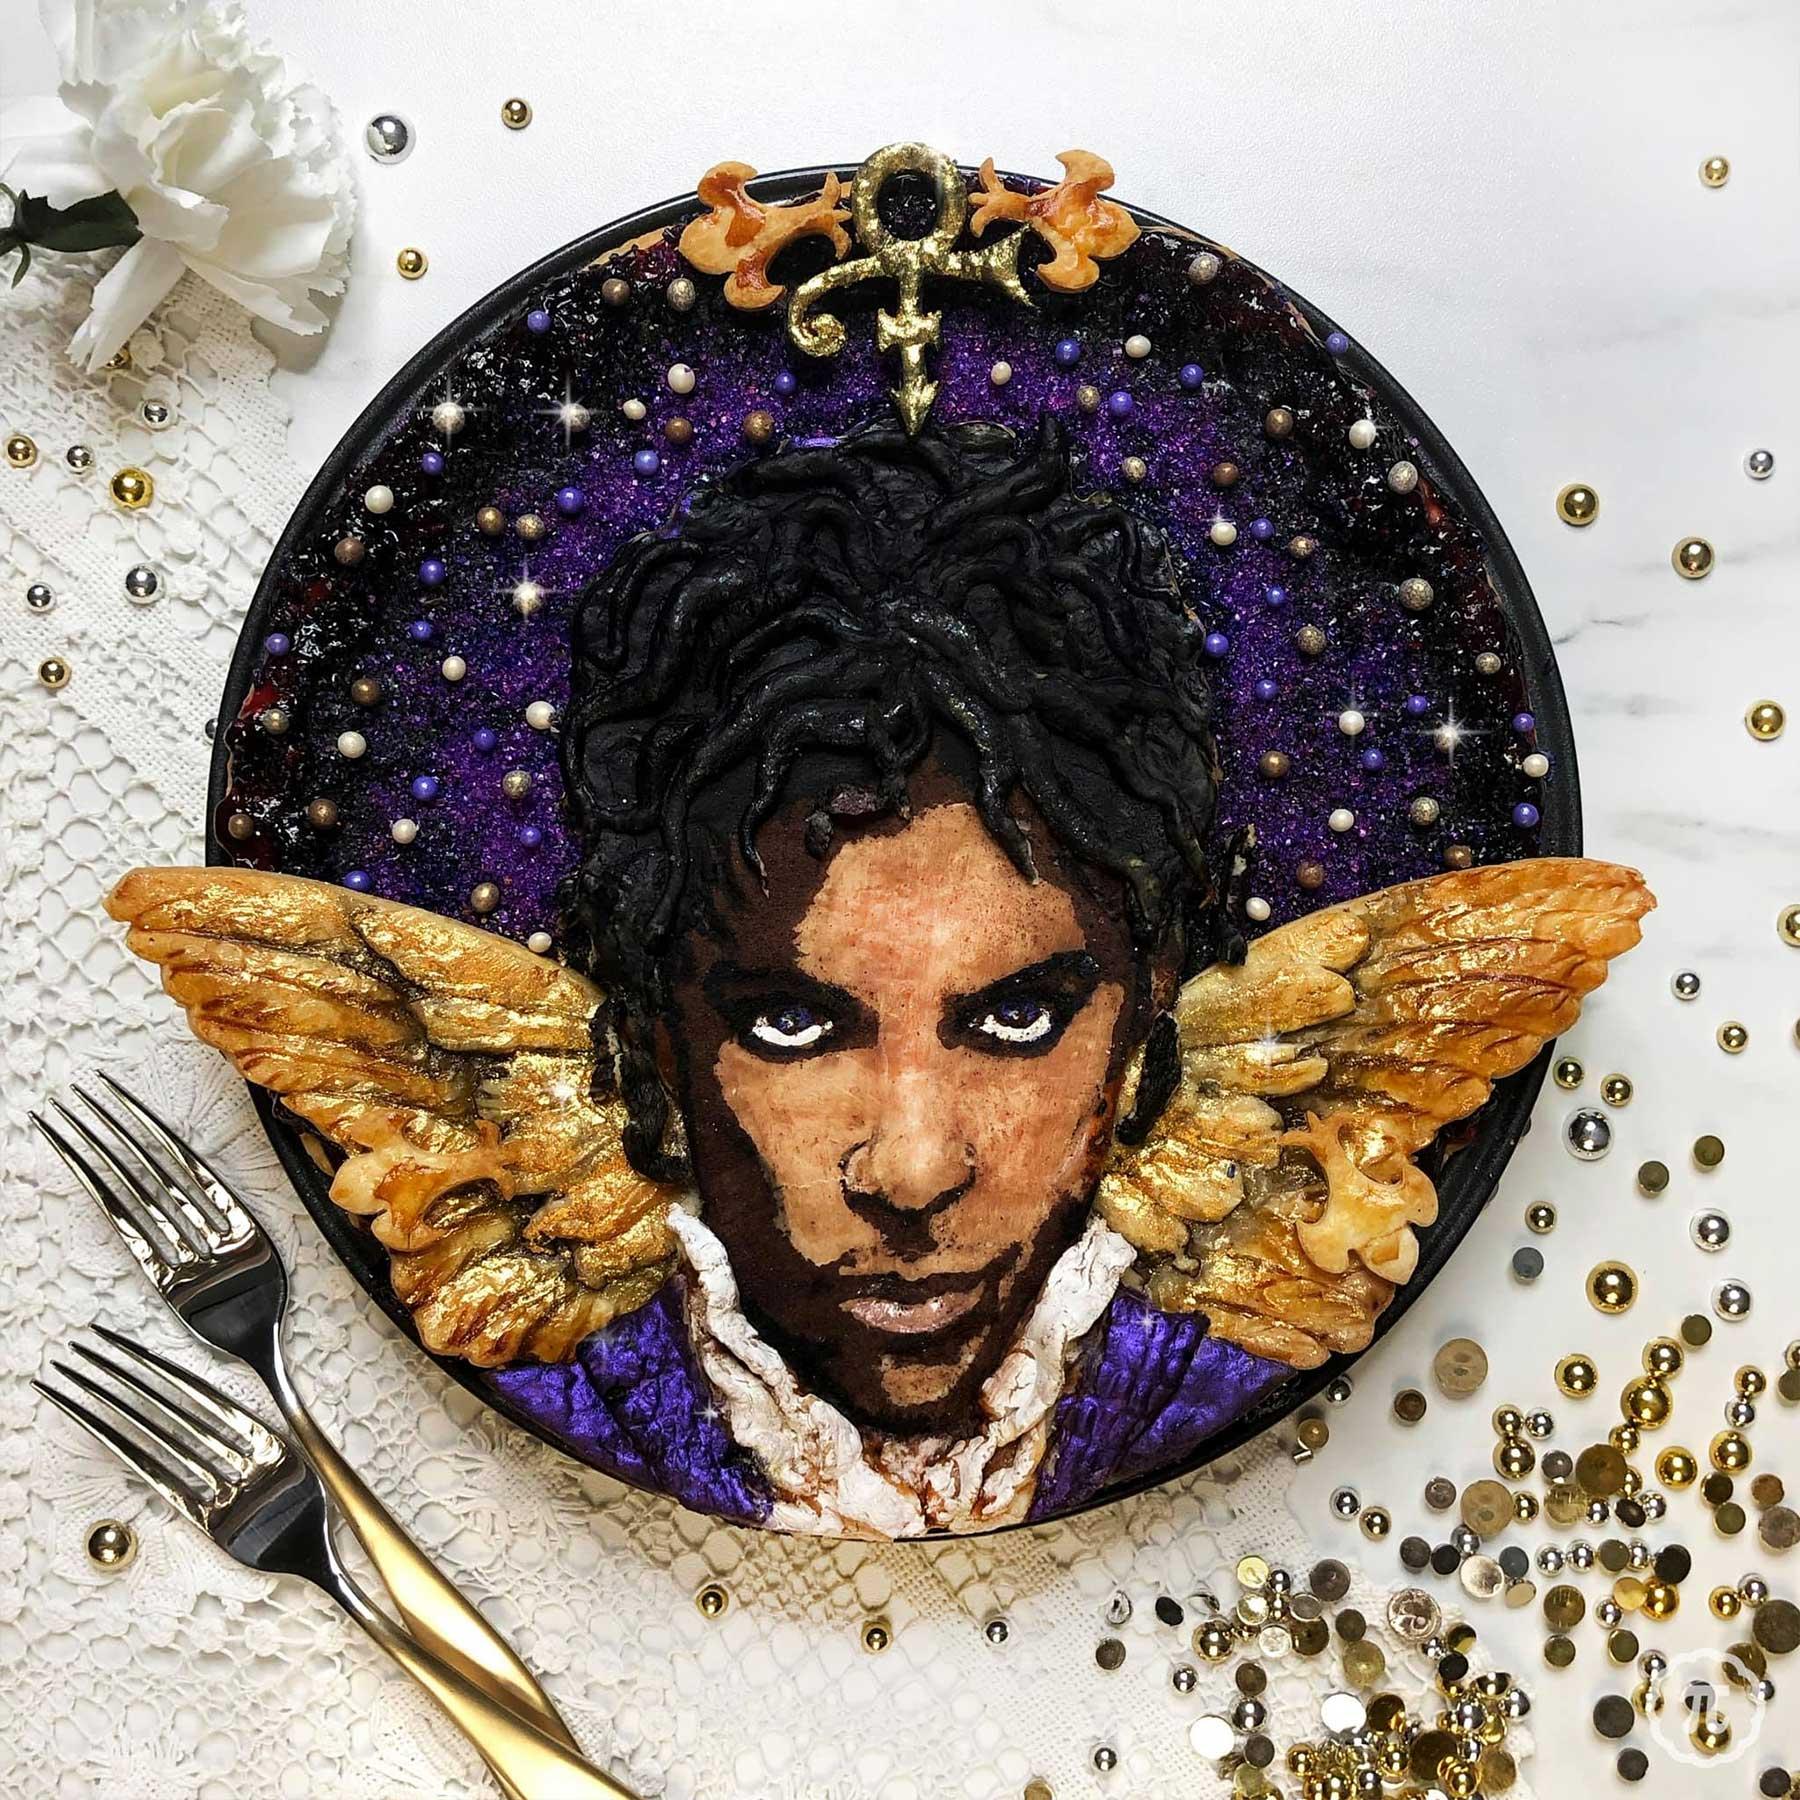 Kreative Kuchenkunst von Jessica Clark-Bojin piesareawesome-Jessica-Clark-Bojin_09